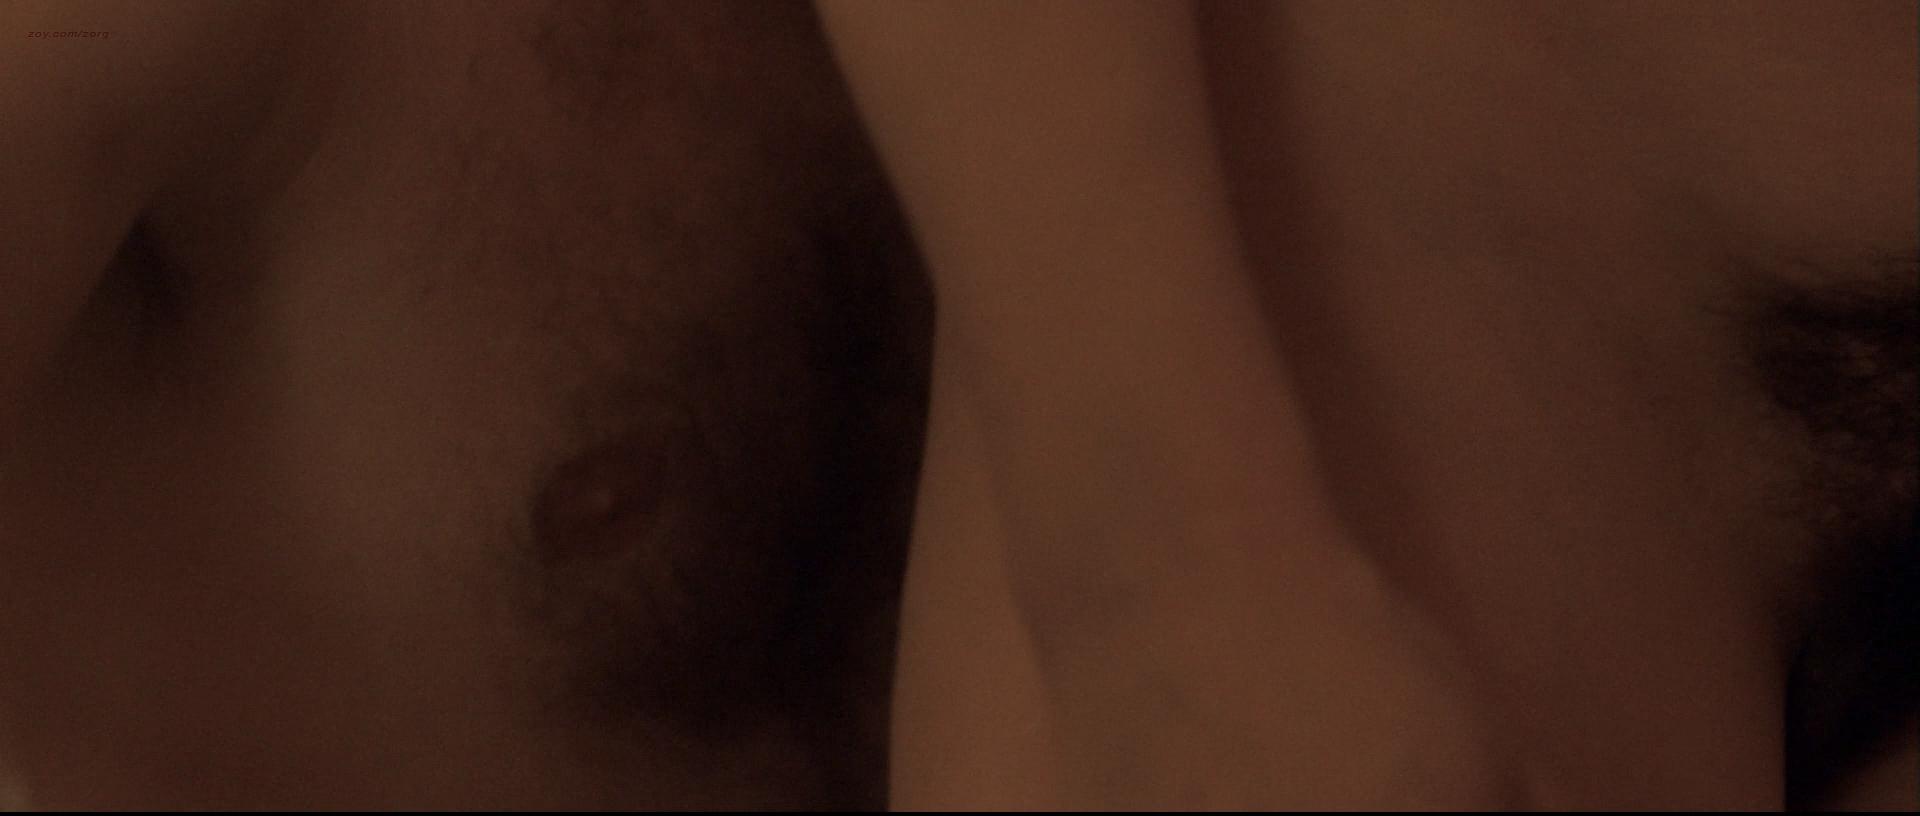 Juliette Binoche nude topless and sex Vera Farmiga nude and Robin Wright hot - Breaking and Entering (2006) HD 1080p BluRay (4)